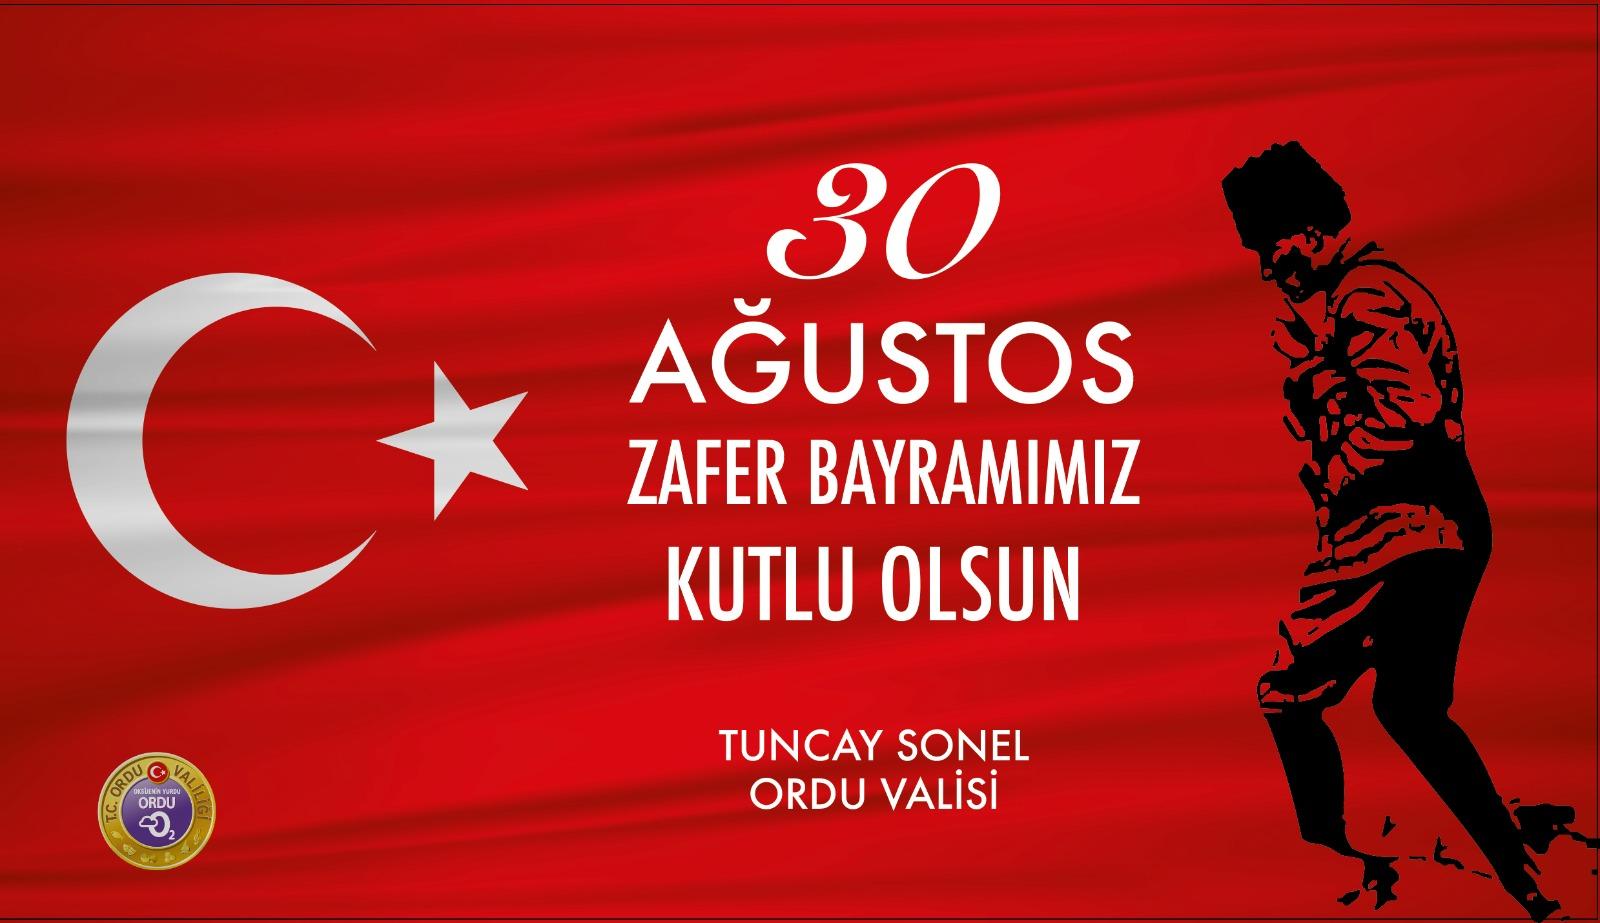 Vali Tuncay SONEL'in 30 Ağustos Zafer Bayramı Mesajı